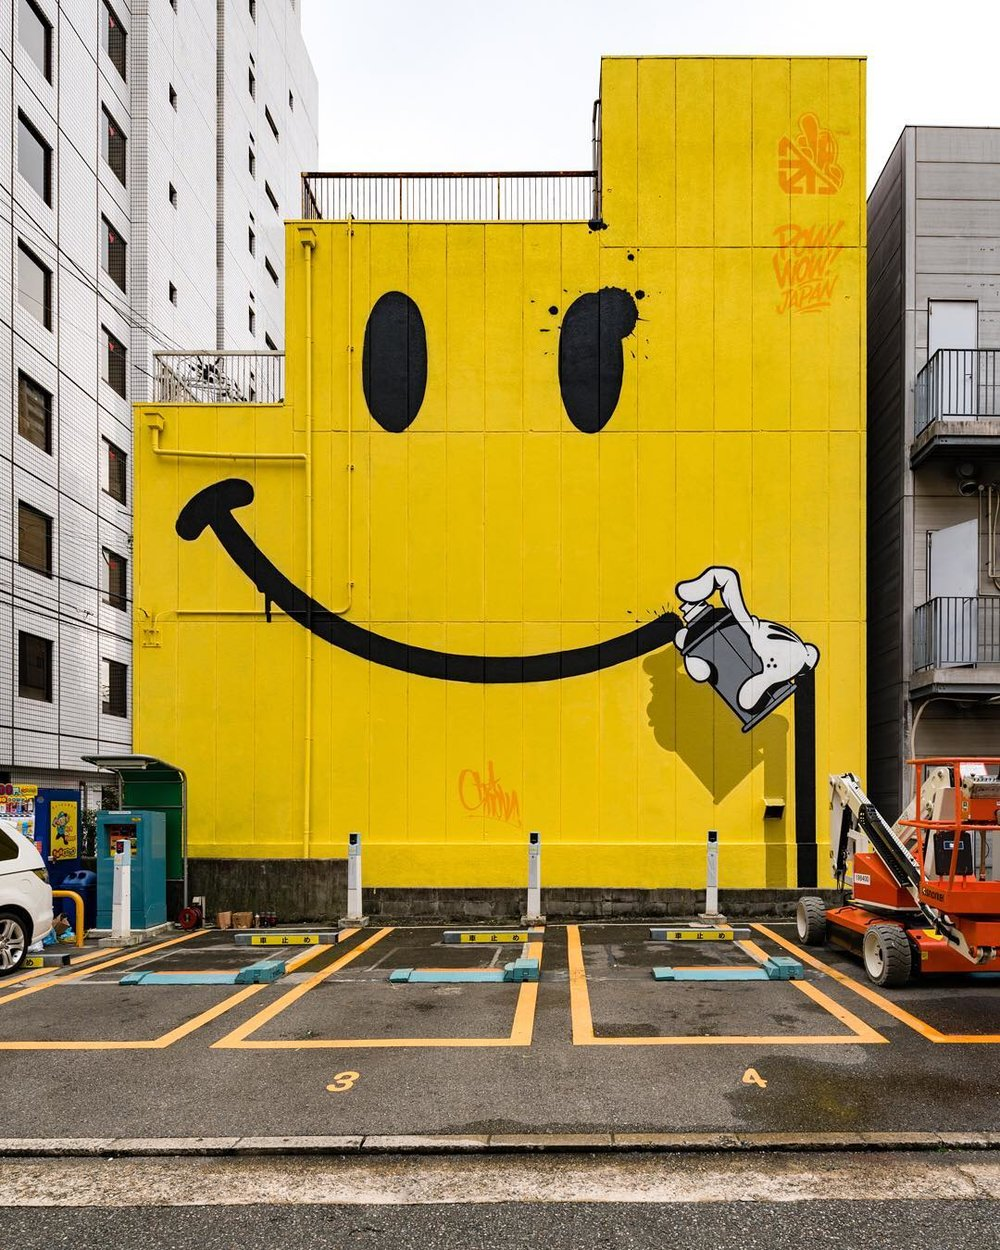 Mural by Slick